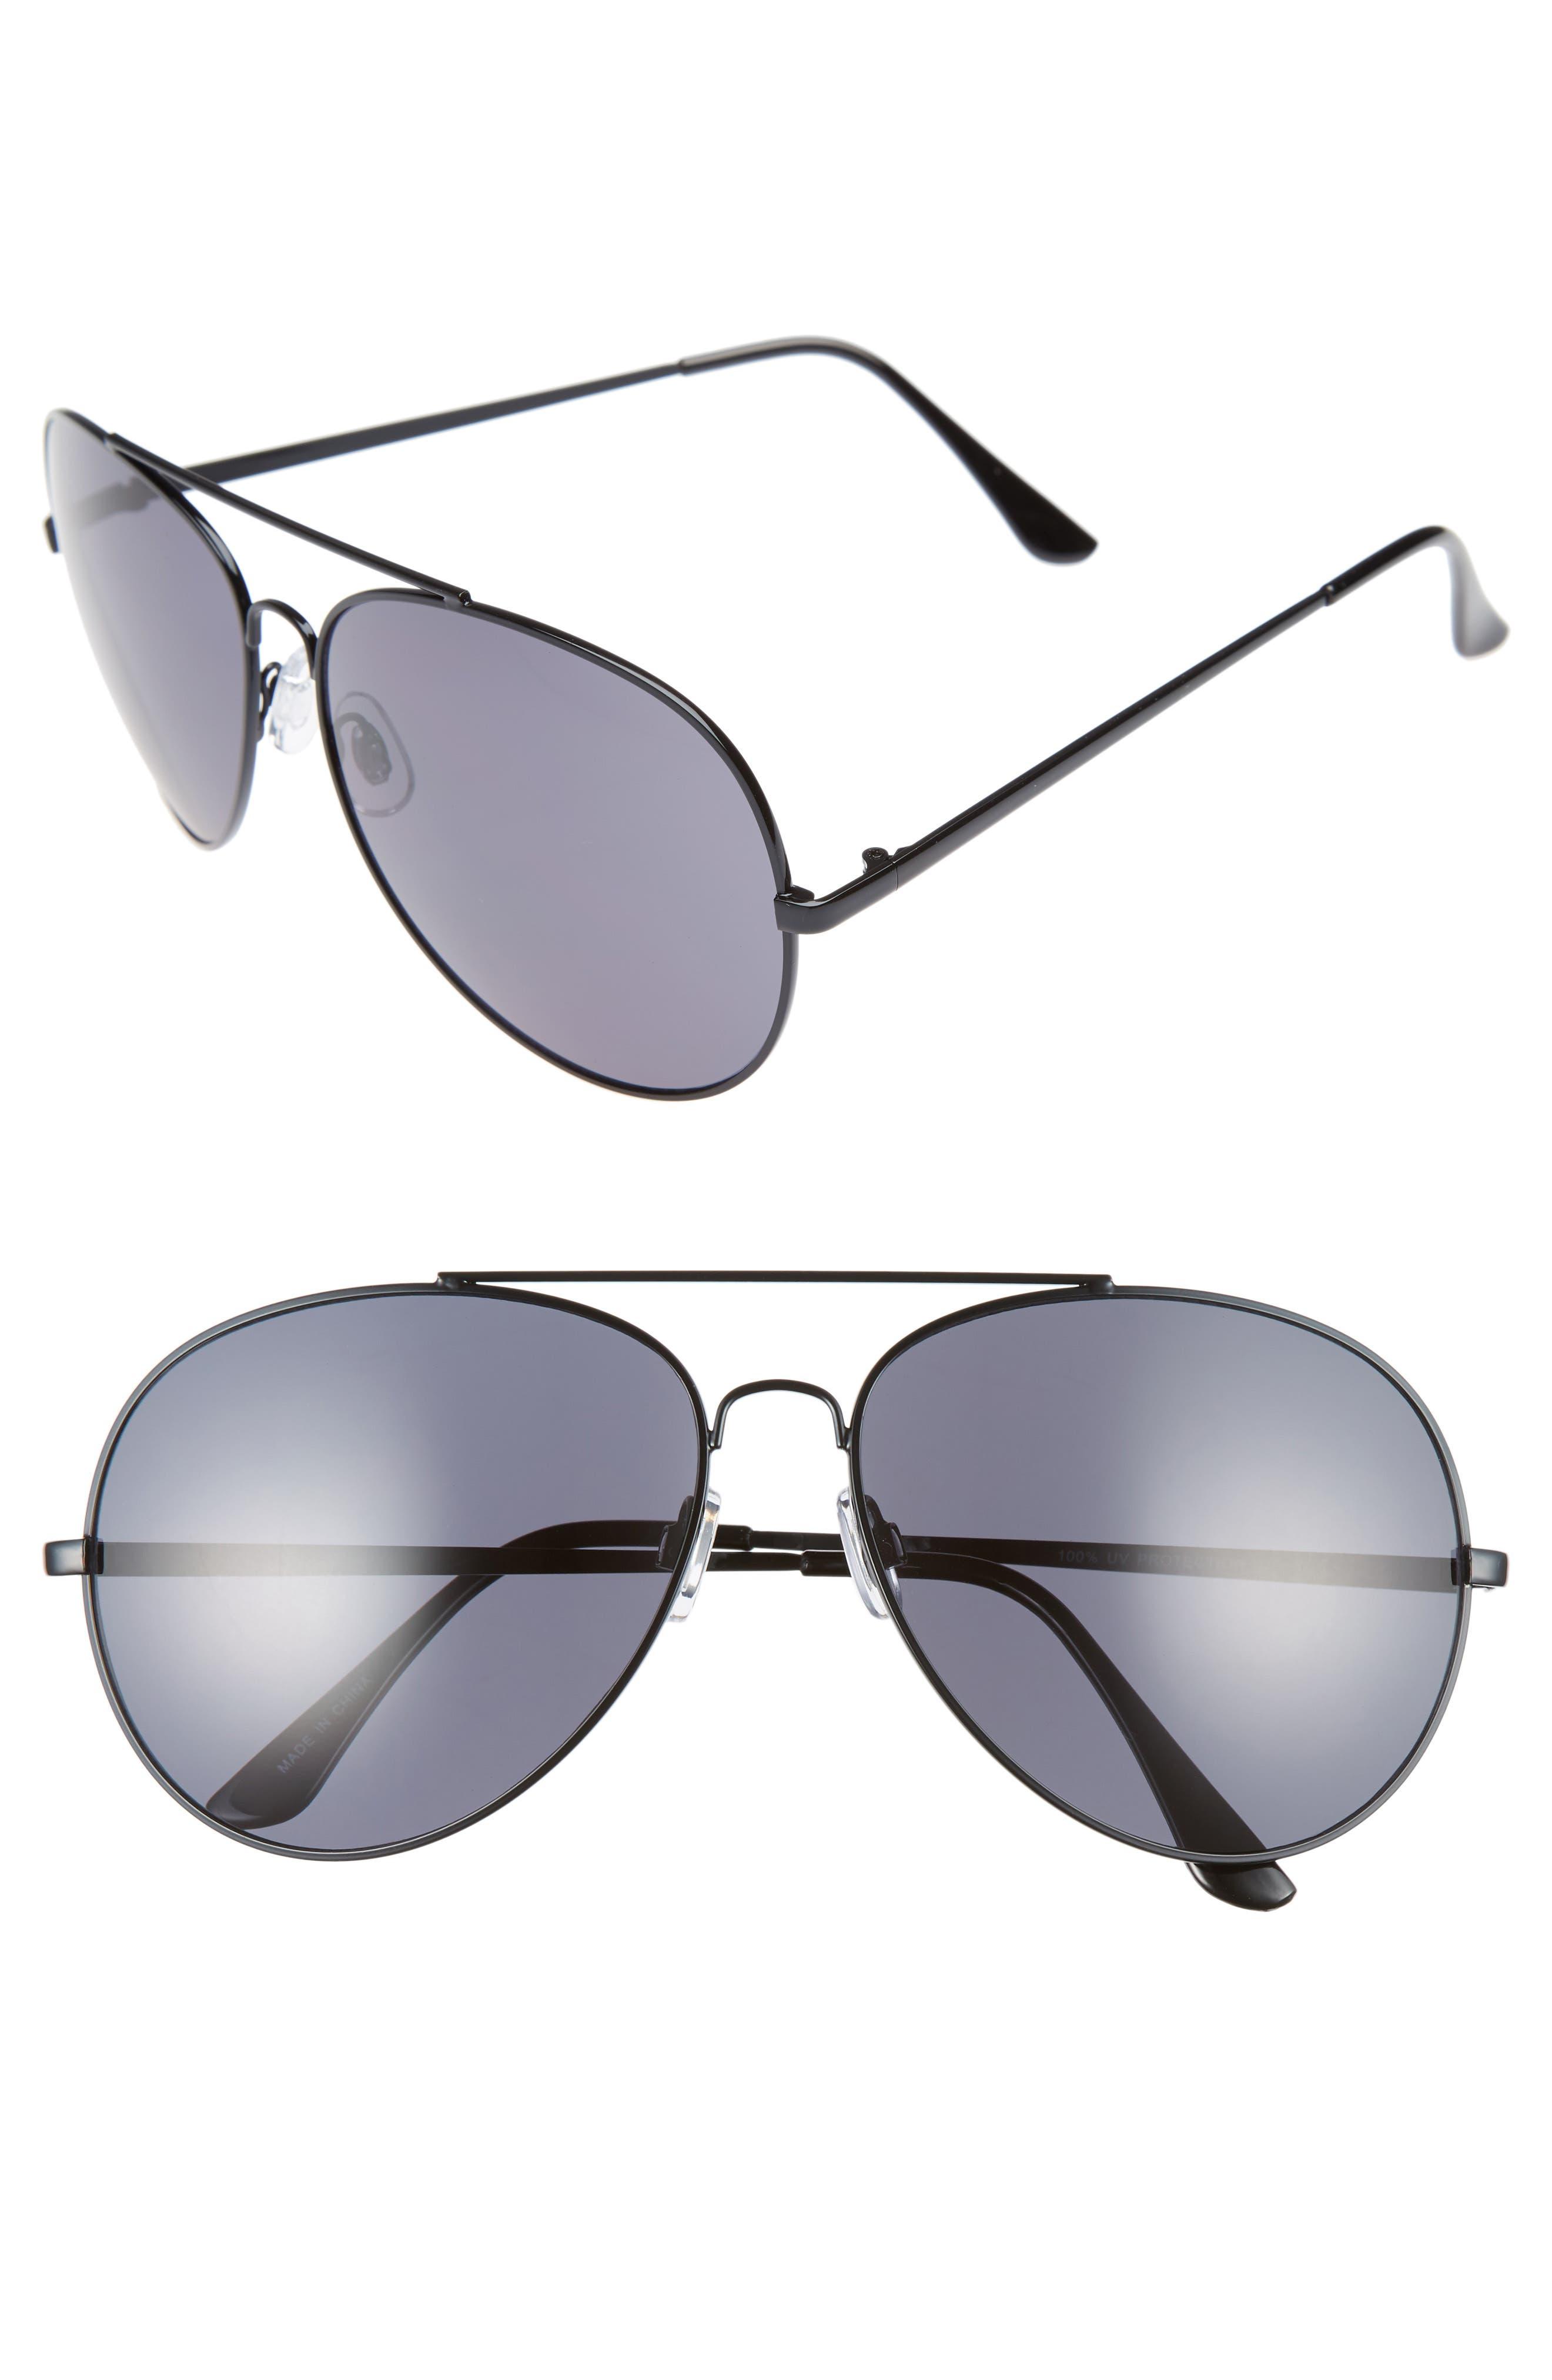 65mm Oversize Aviator Sunglasses,                             Alternate thumbnail 2, color,                             001